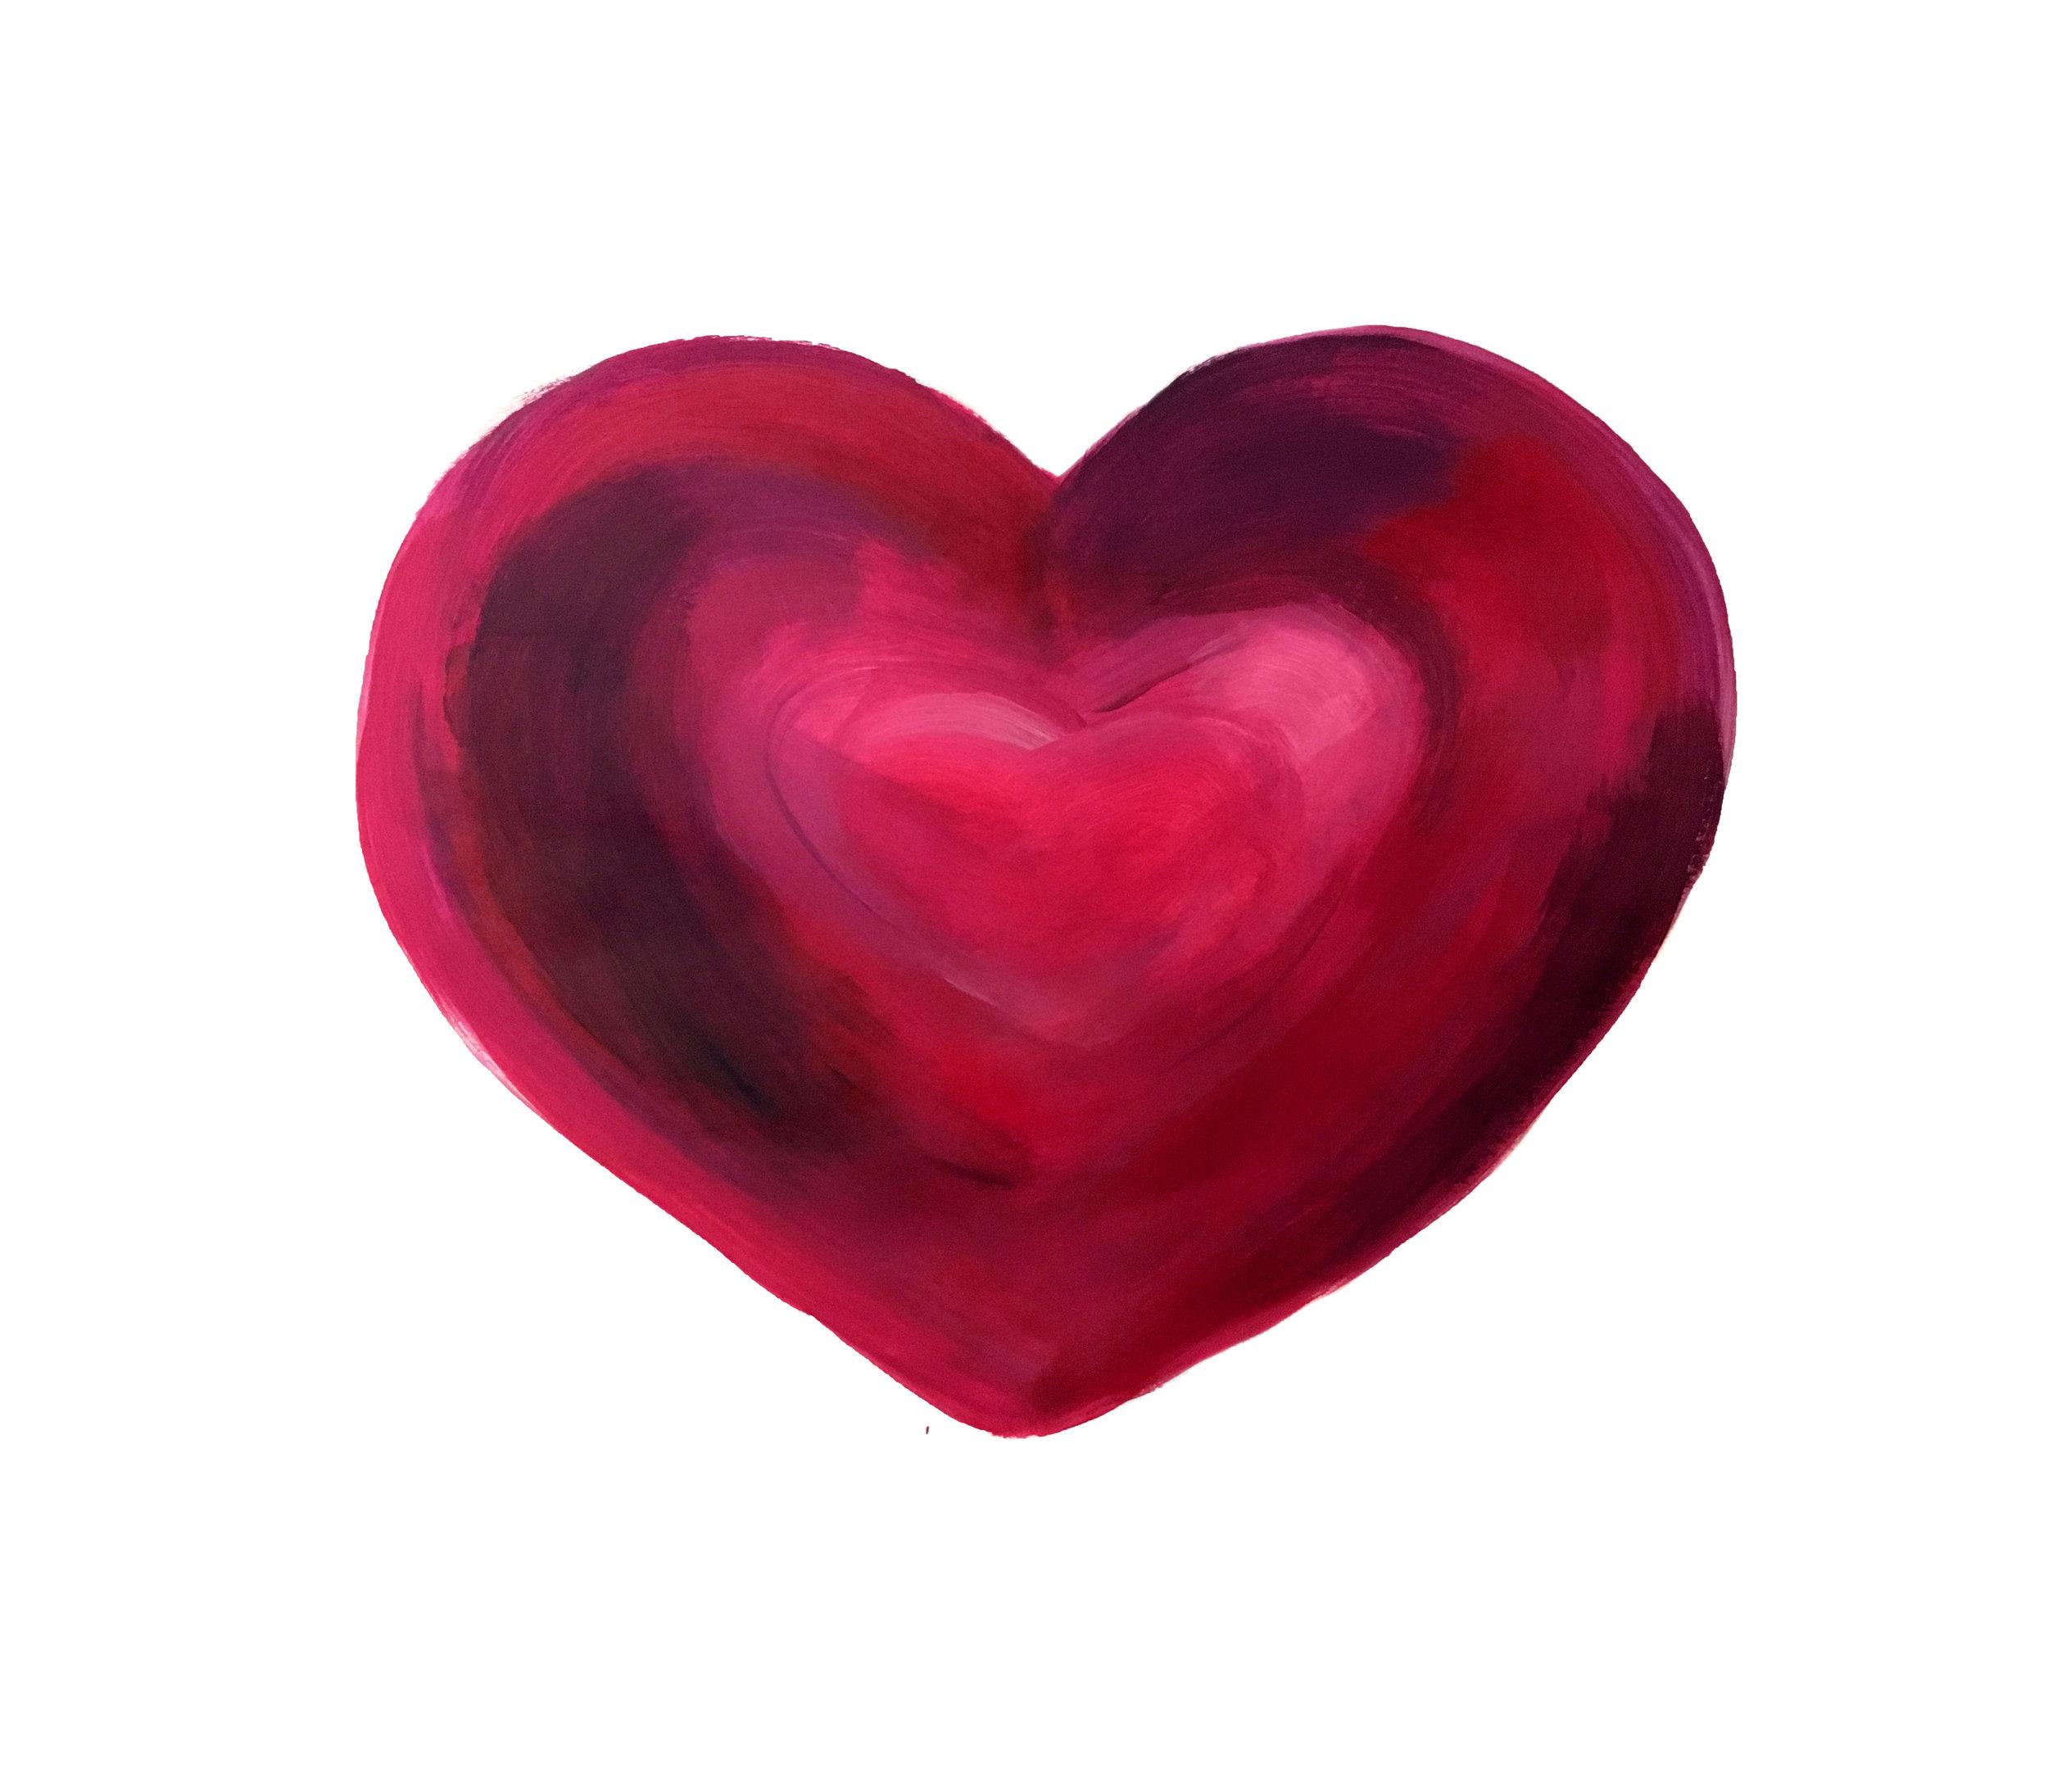 HEART_NO_LOGO.jpg